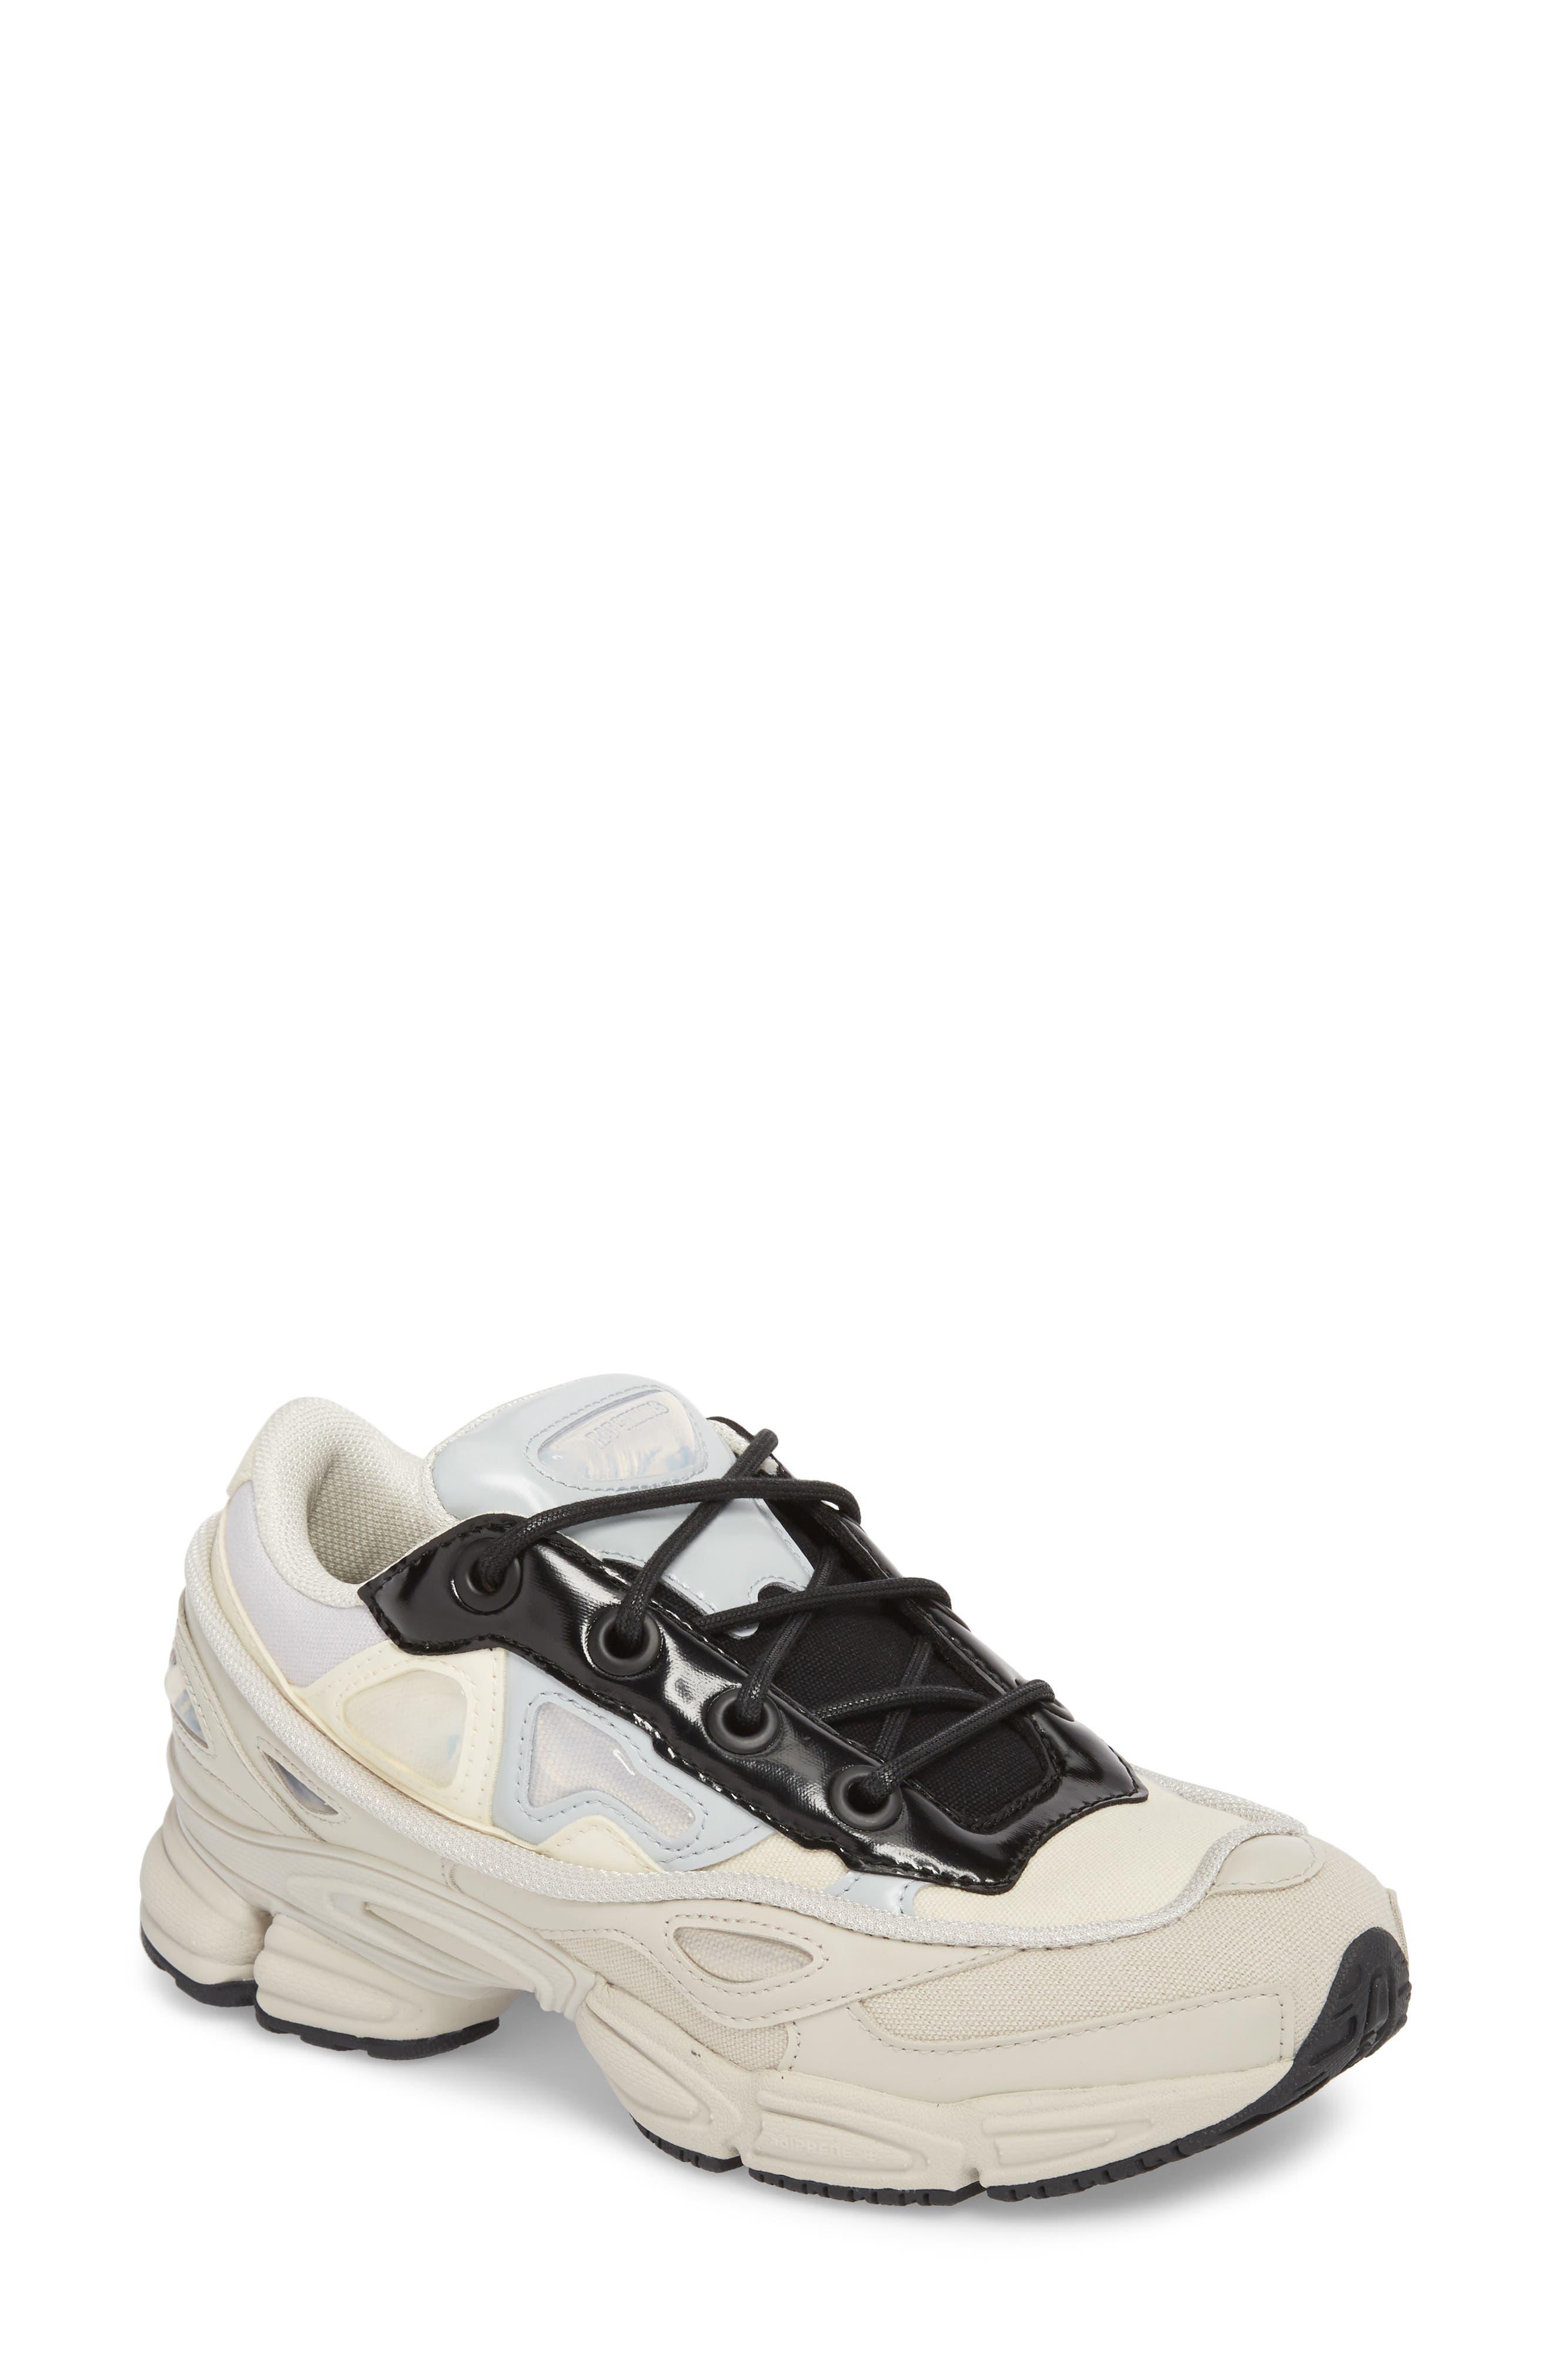 adidas by Raf Simons Ozweego III Sneaker,                         Main,                         color, Cream White/ Mist Stone/ Black